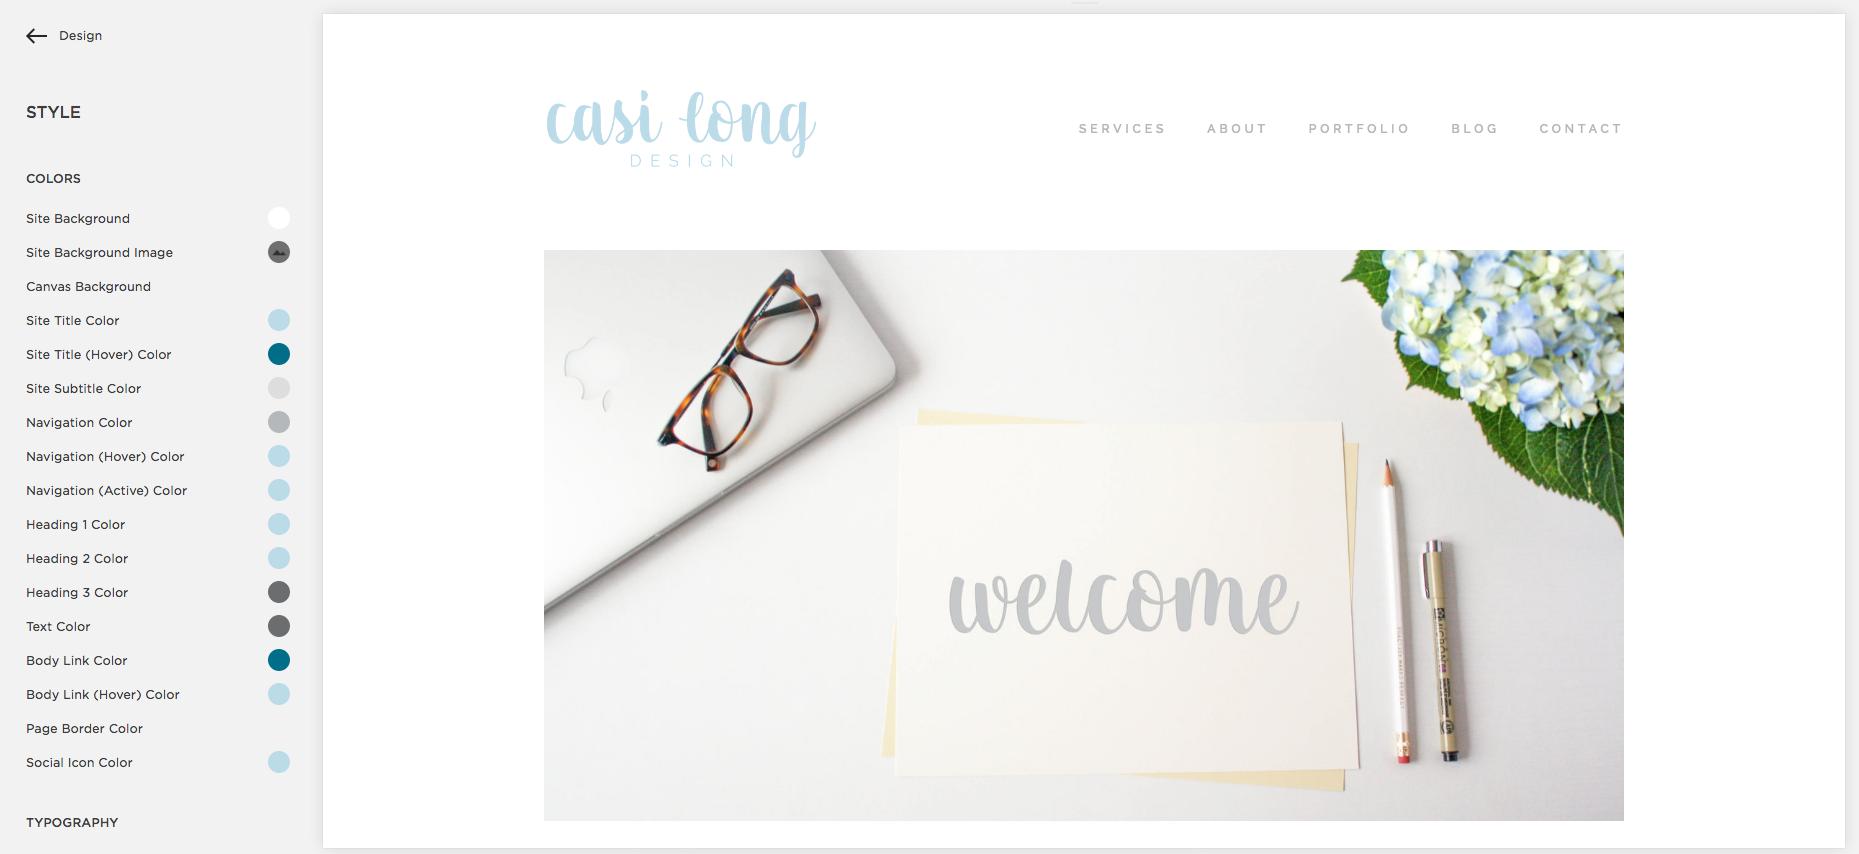 Squarespace Dashboard, Style Editor   casilong.com